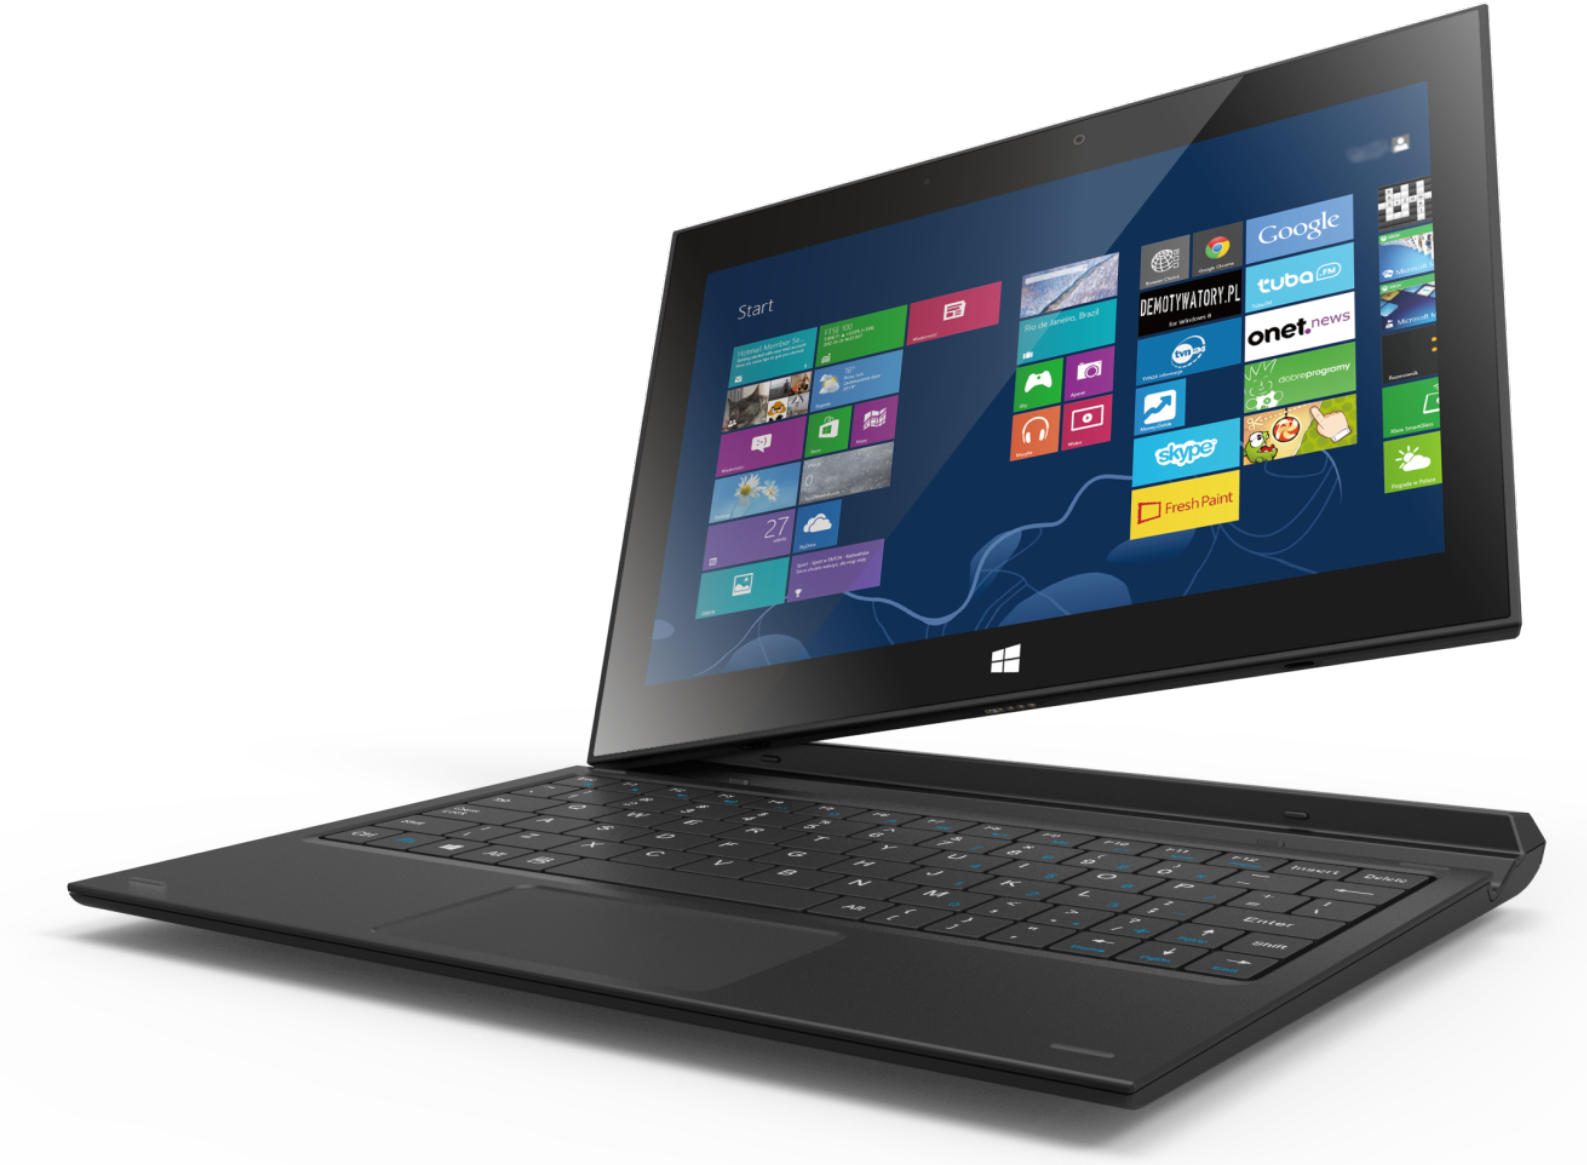 A933L_Tablet_Keyboard